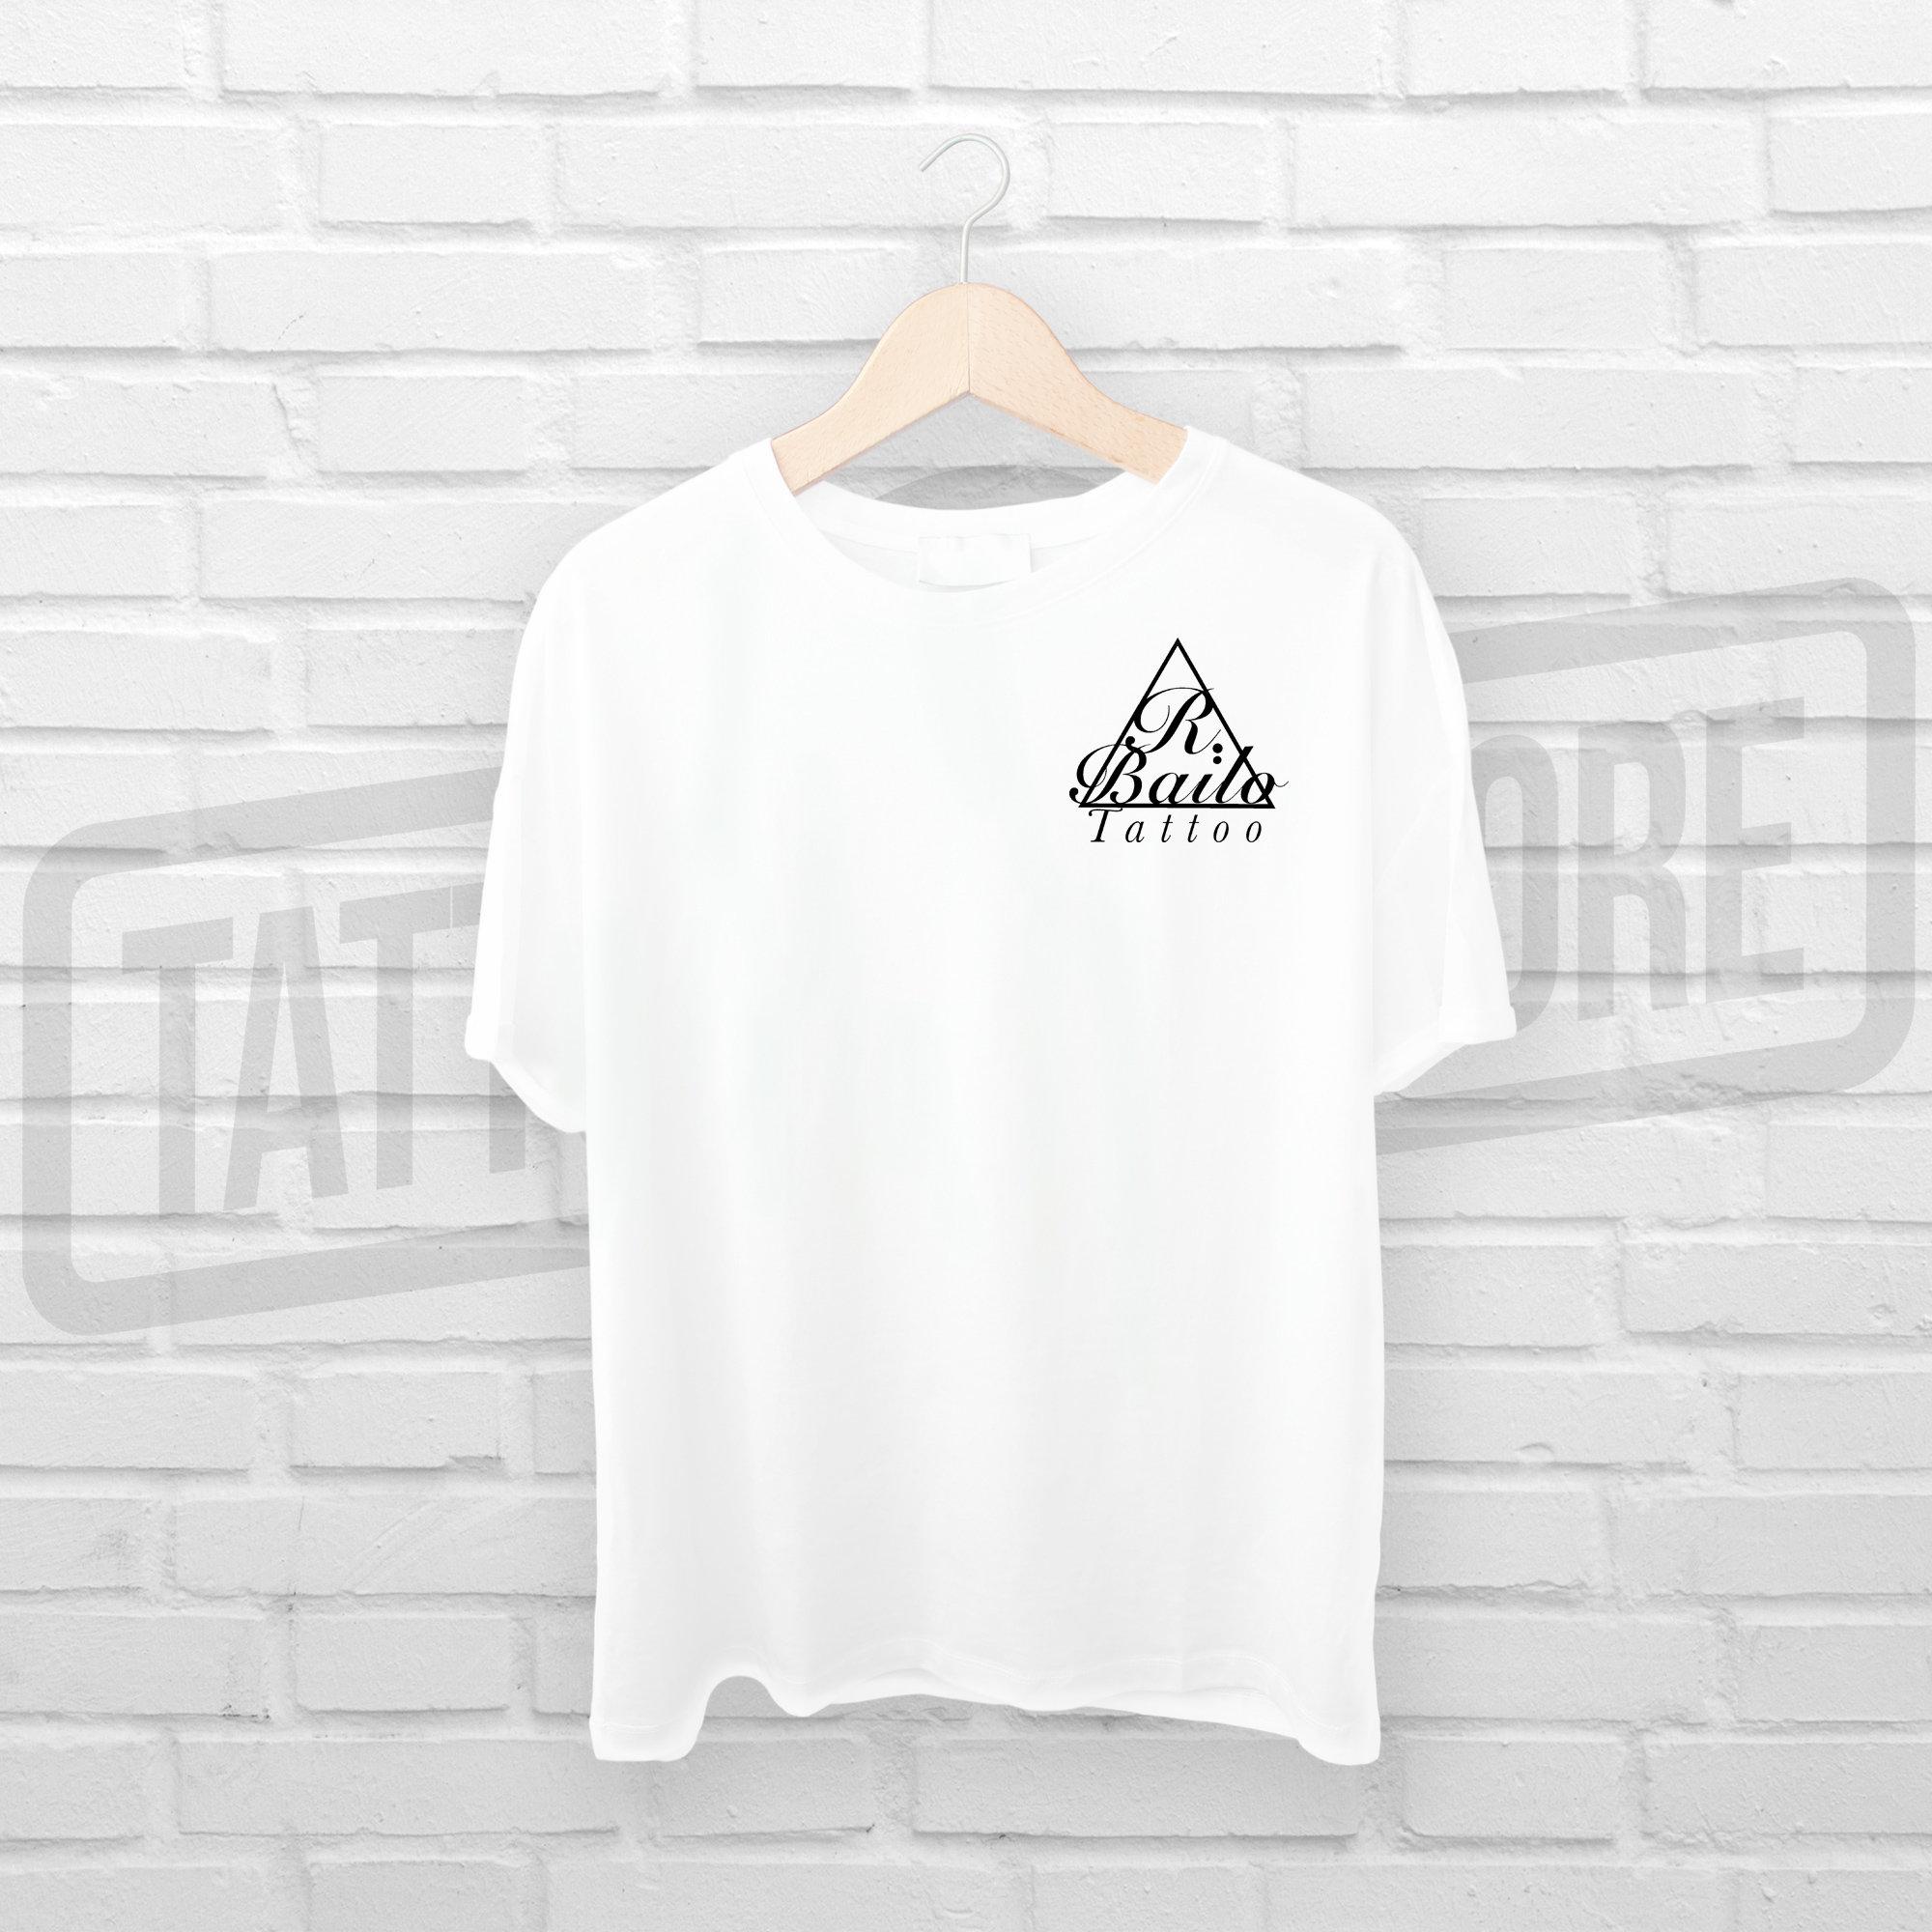 Camiseta Bailo Tattoo